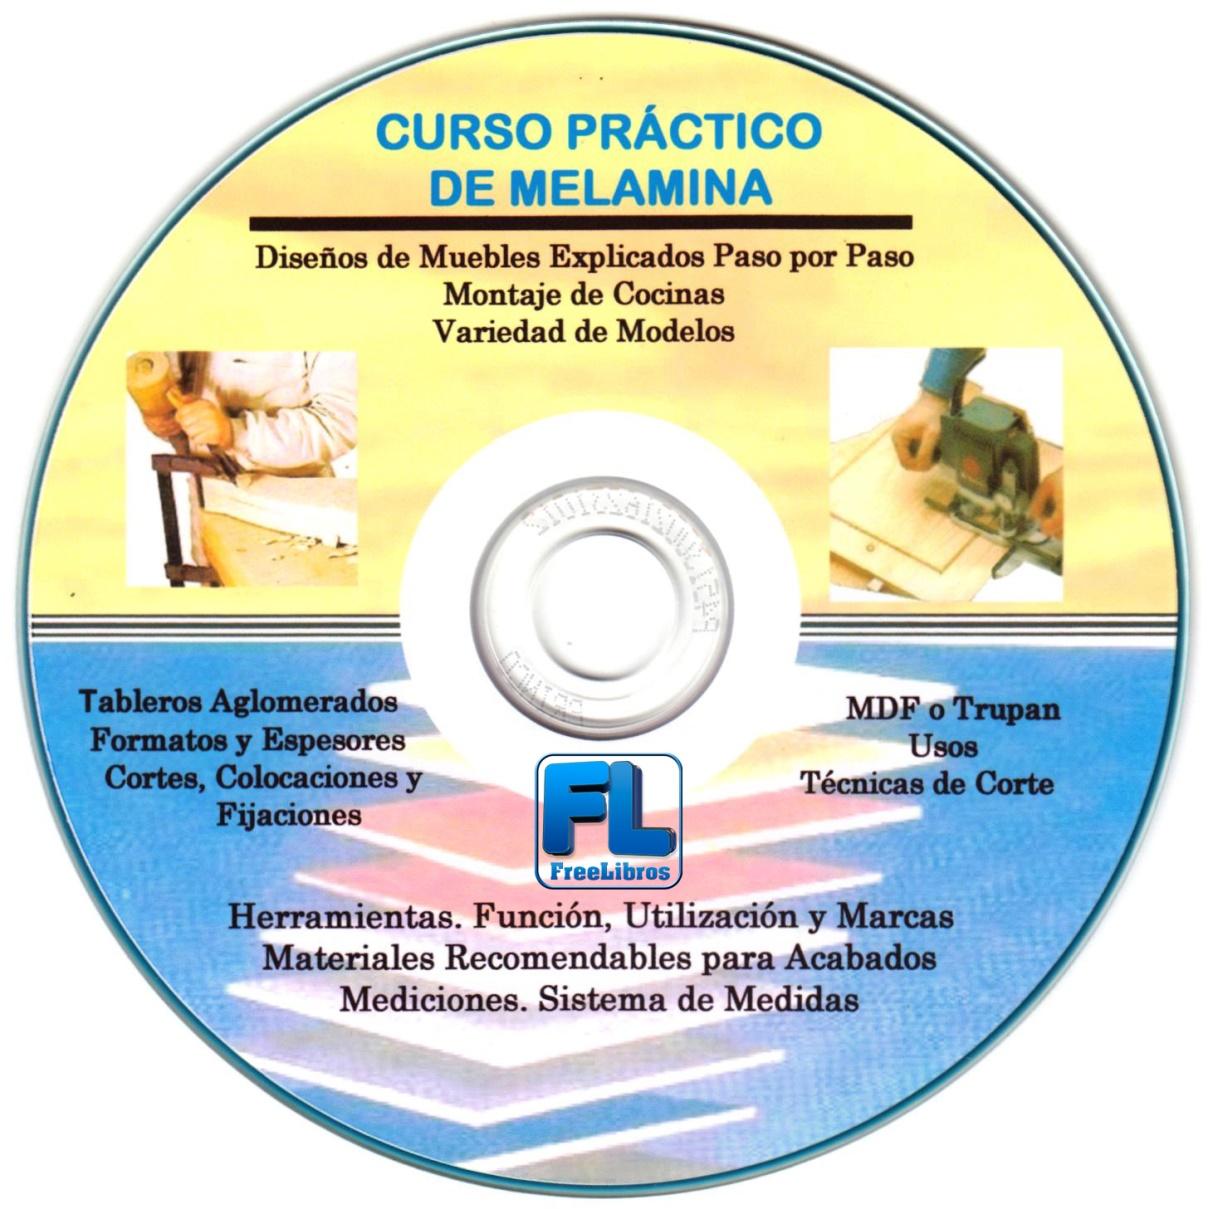 Curso pr ctico de melamina freelibros for Melamina cursos gratis